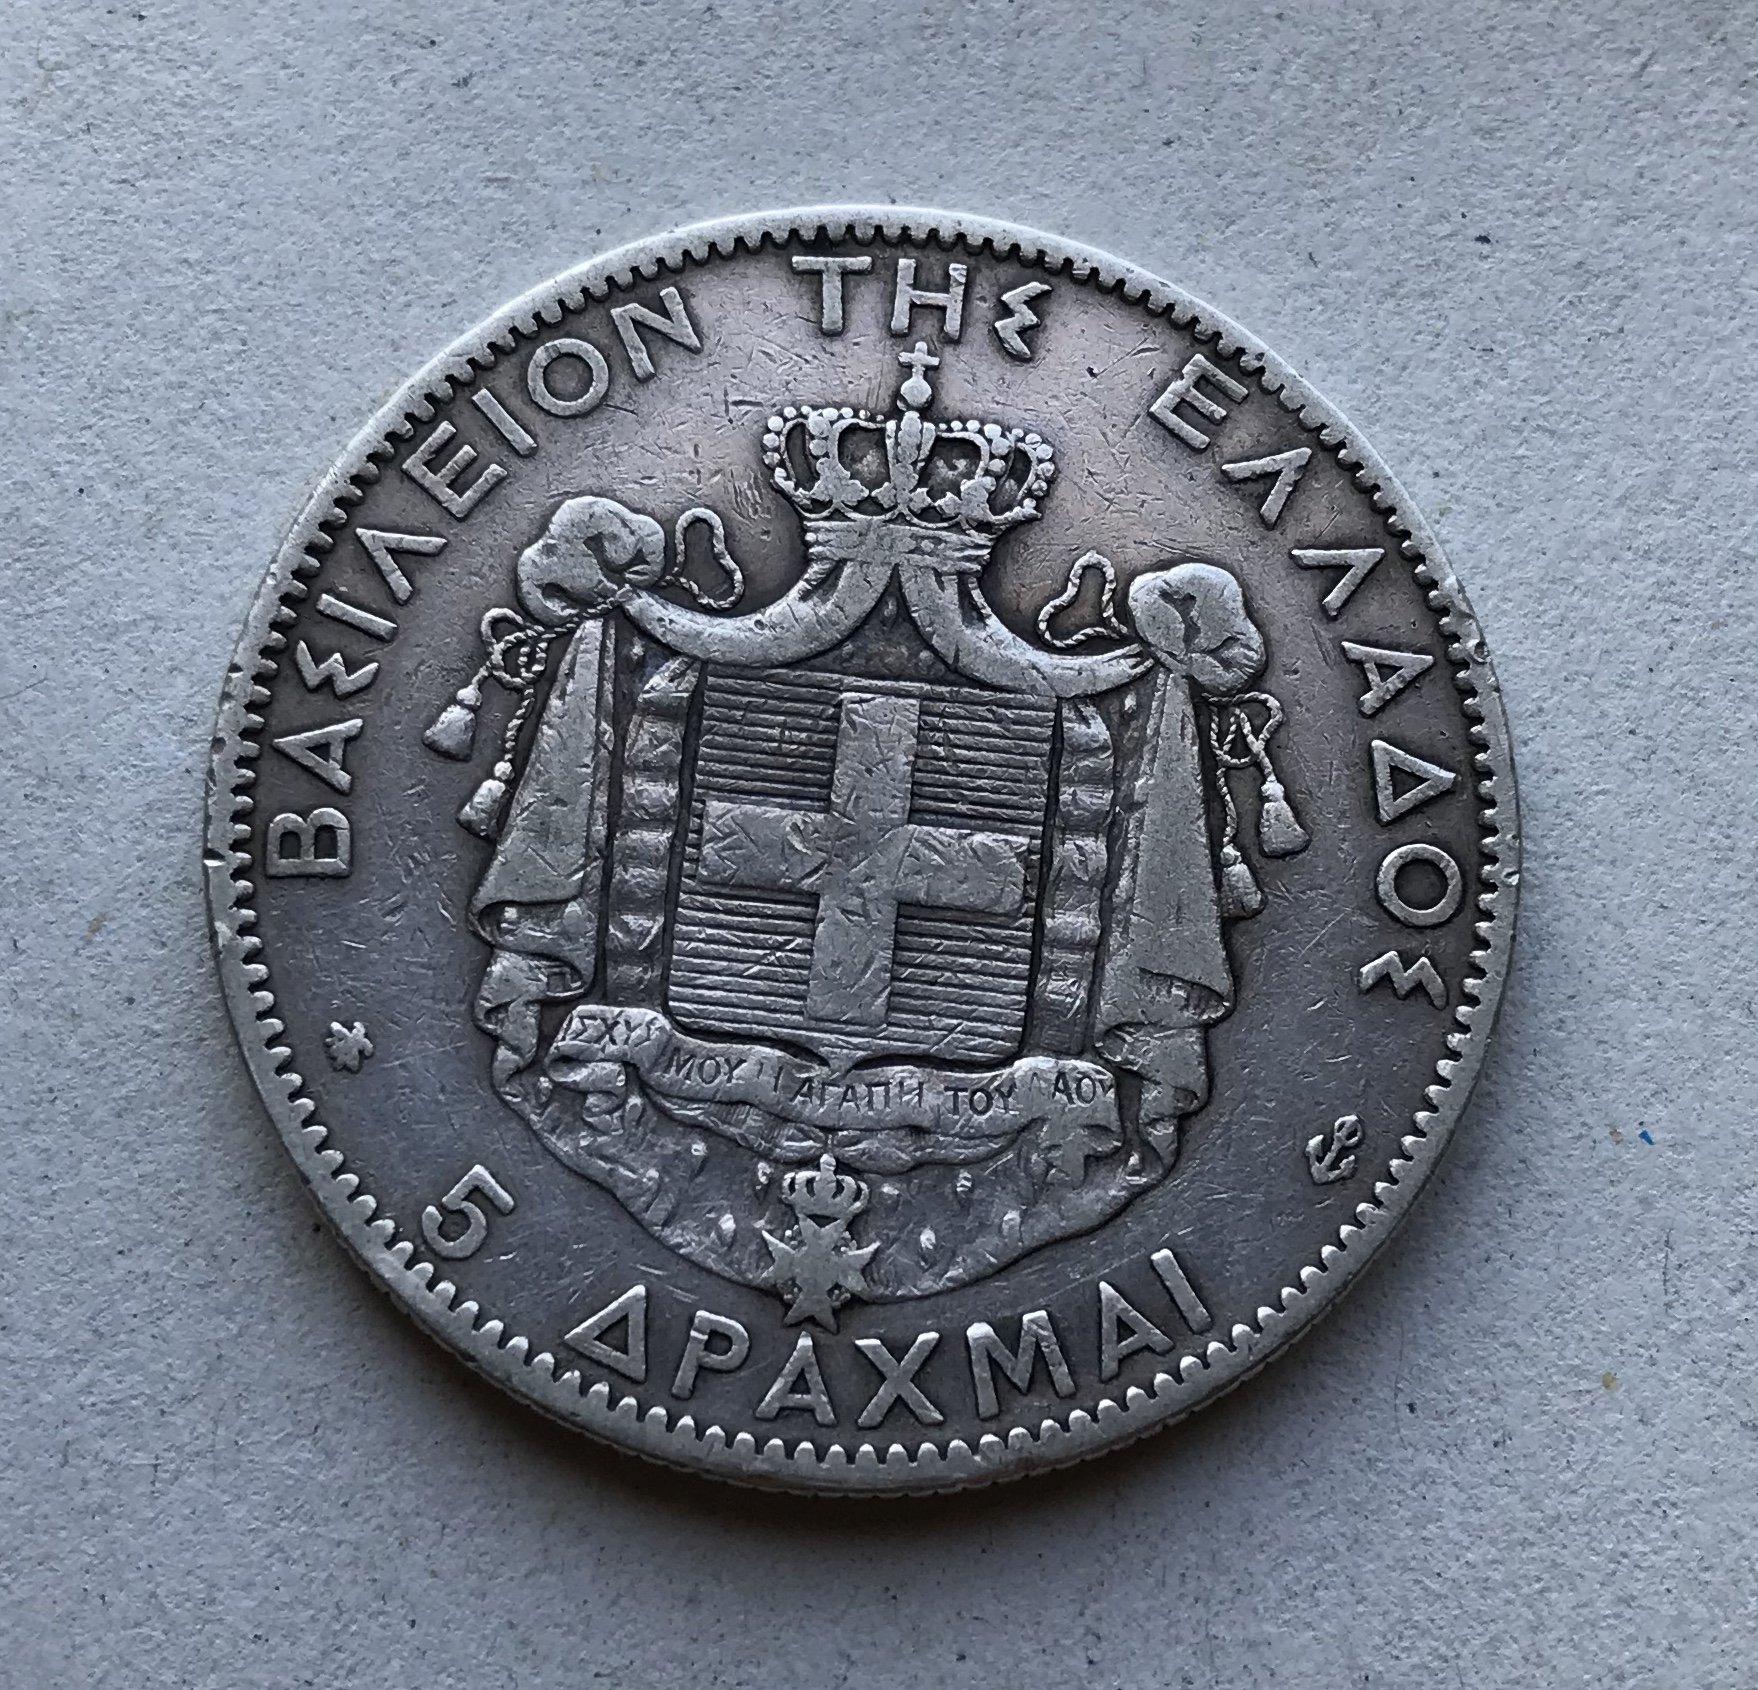 Scambio monete mondiali